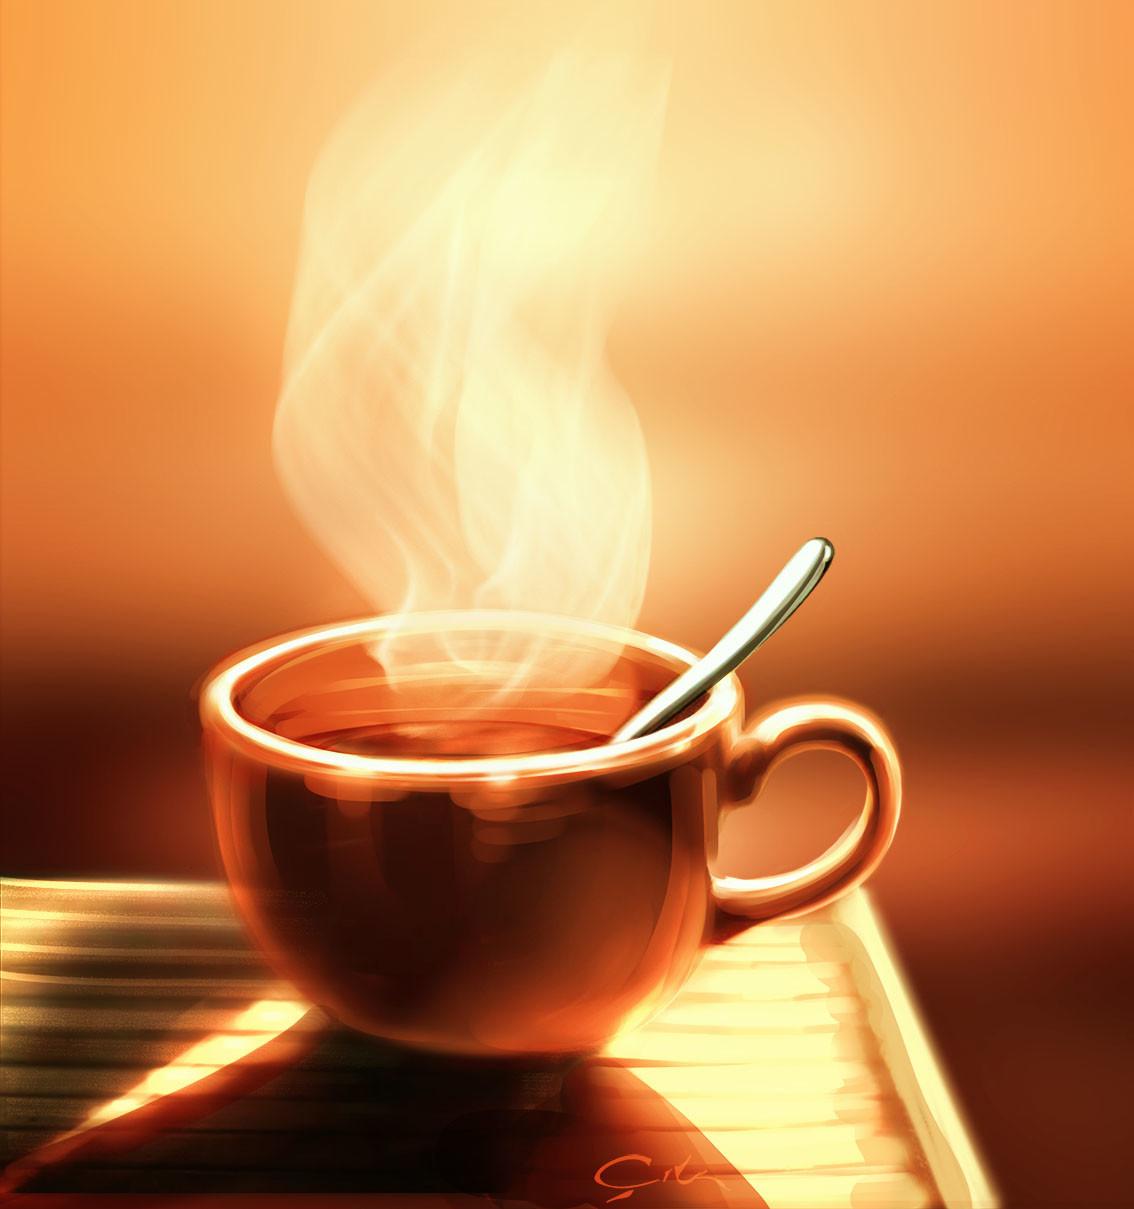 Emrullah cita tea